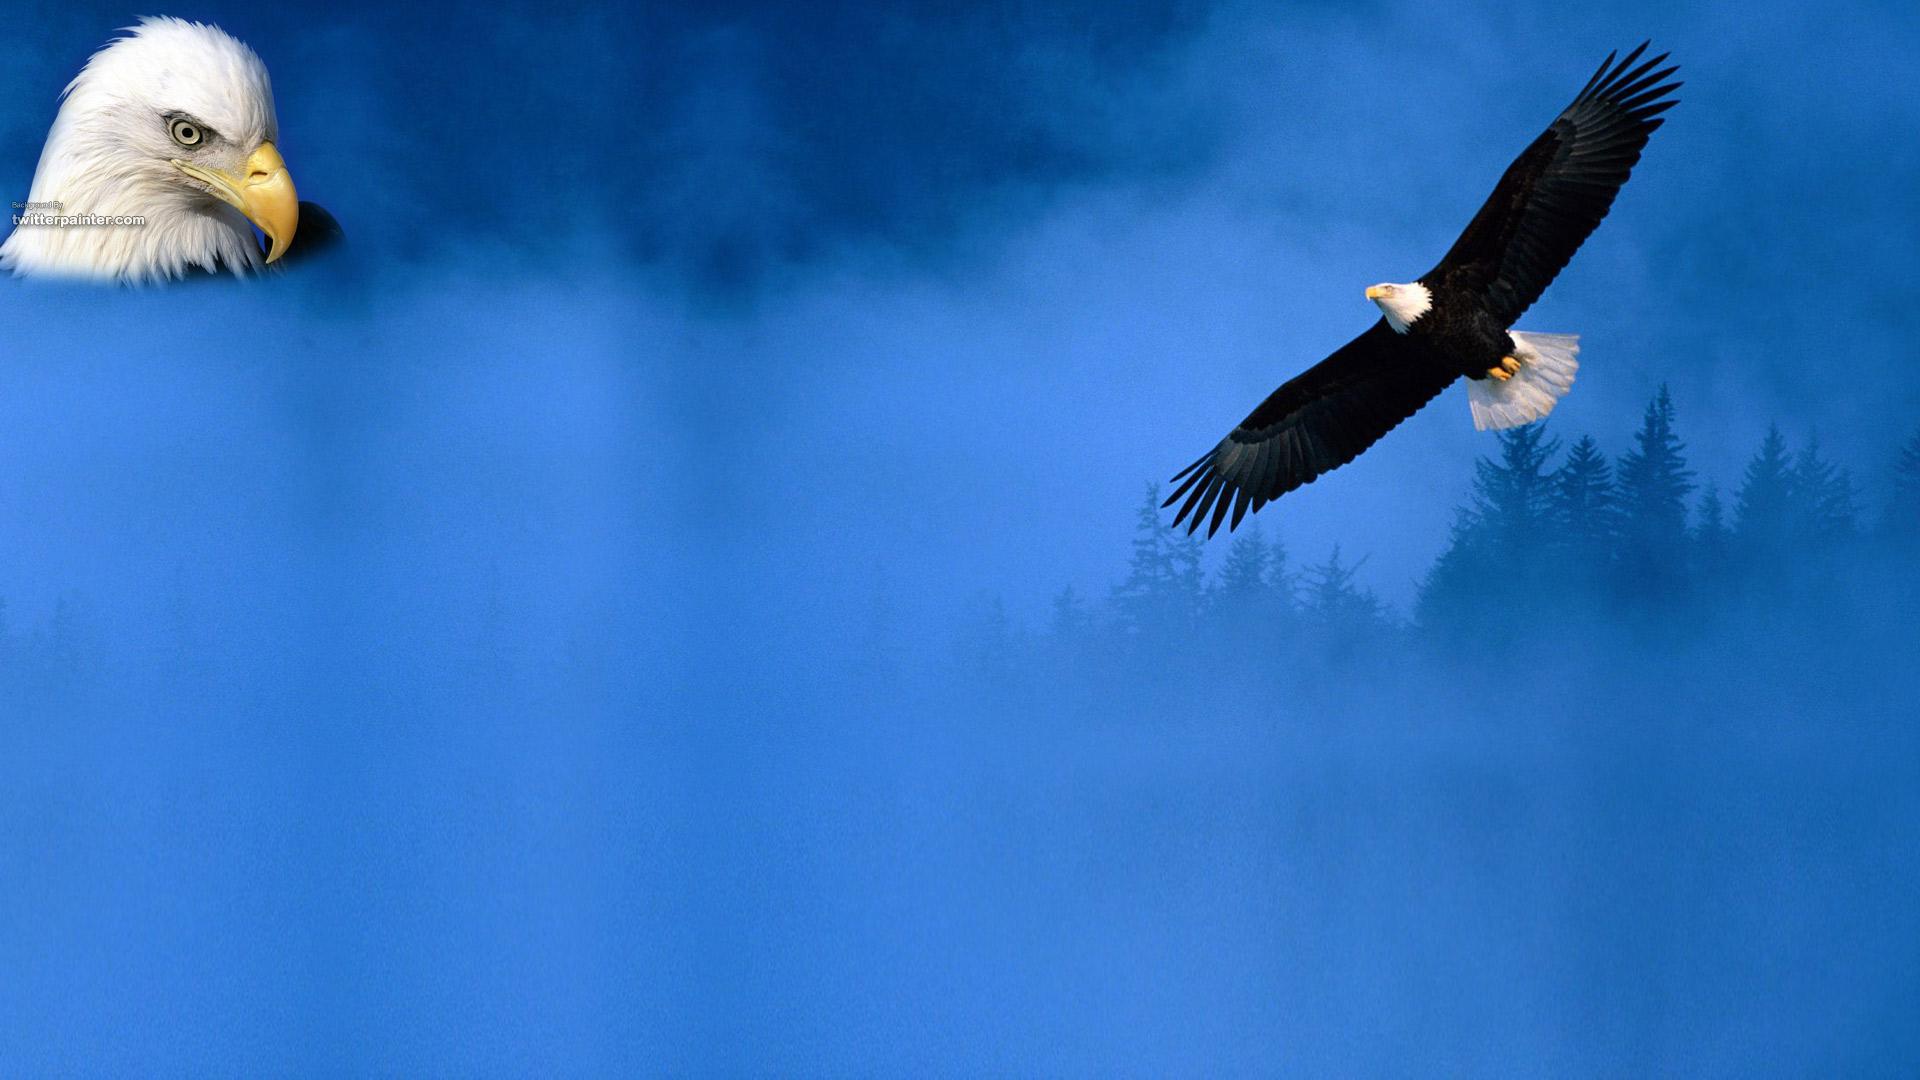 Desktop hd eagle and american flag images Download 3d HD colour design 1920x1080